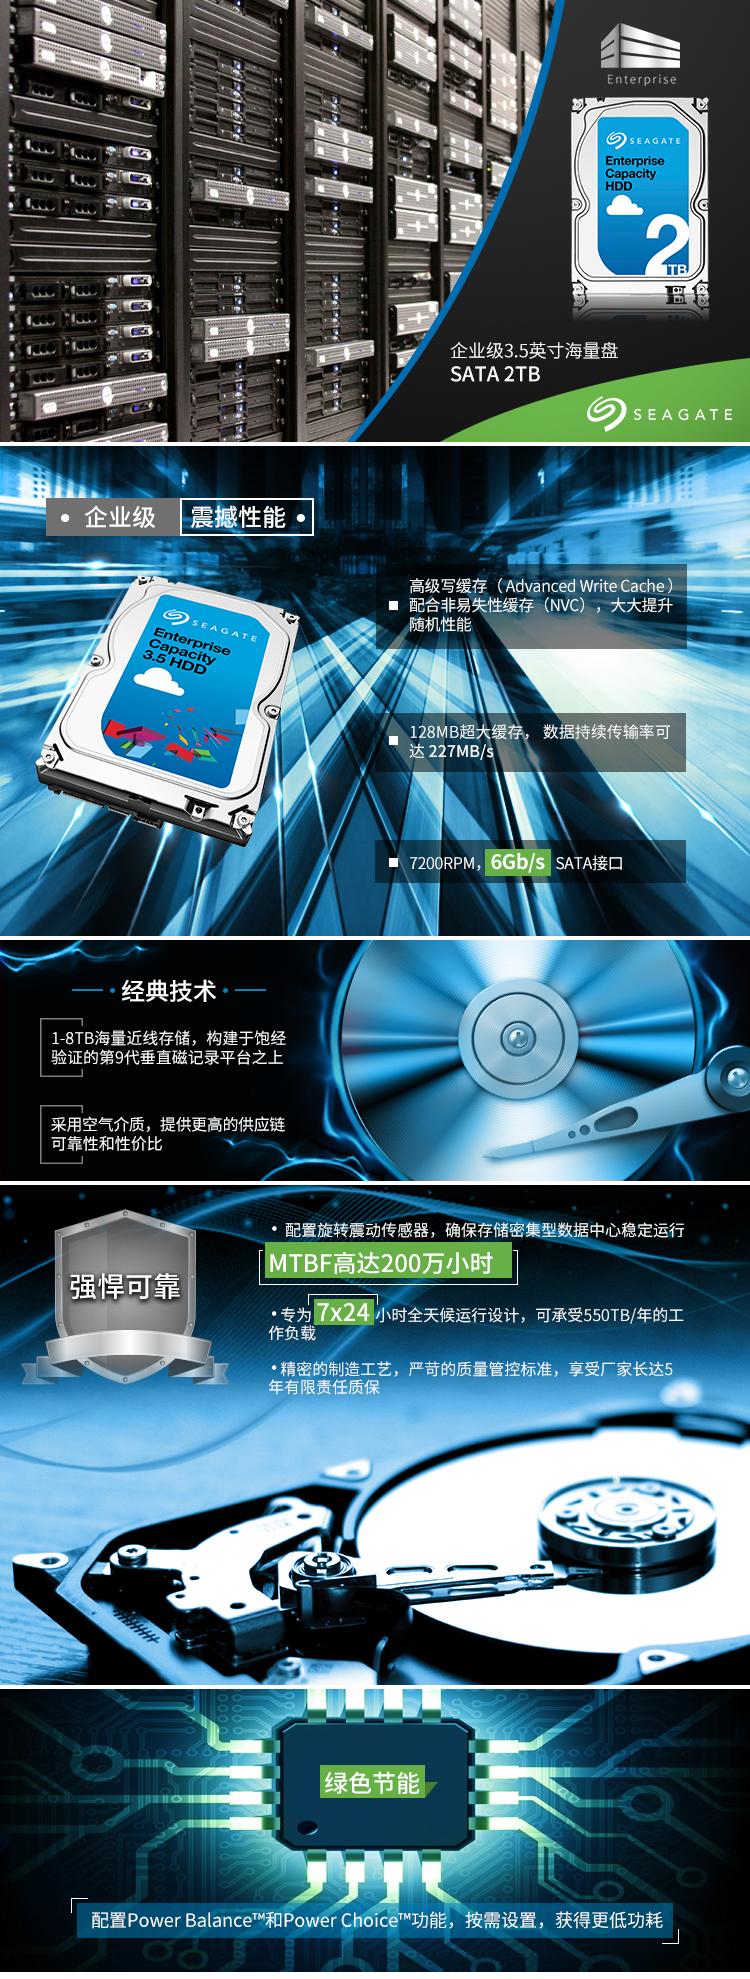 希捷 ST2000NM0008 系列 2TB 7200转 512n 128M SATA 企业级硬盘